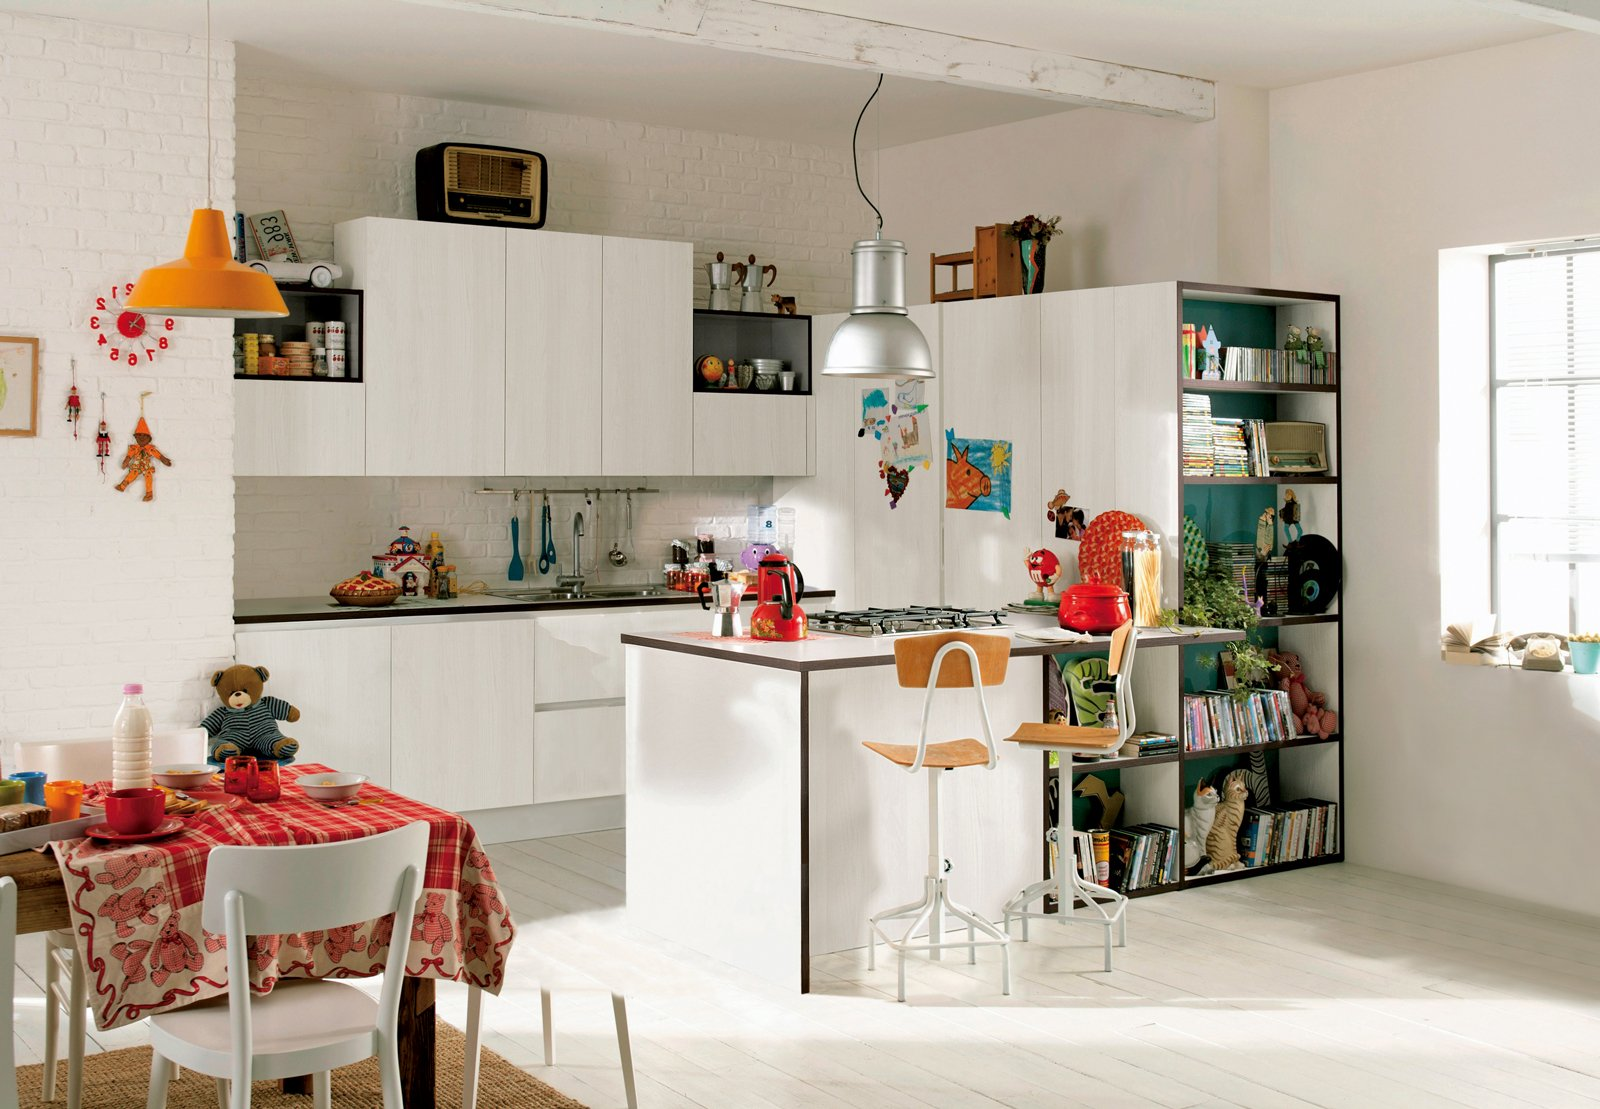 Soluzioni per cucine piccole variazioni finitura olmo ha - Cucine idee e soluzioni ...